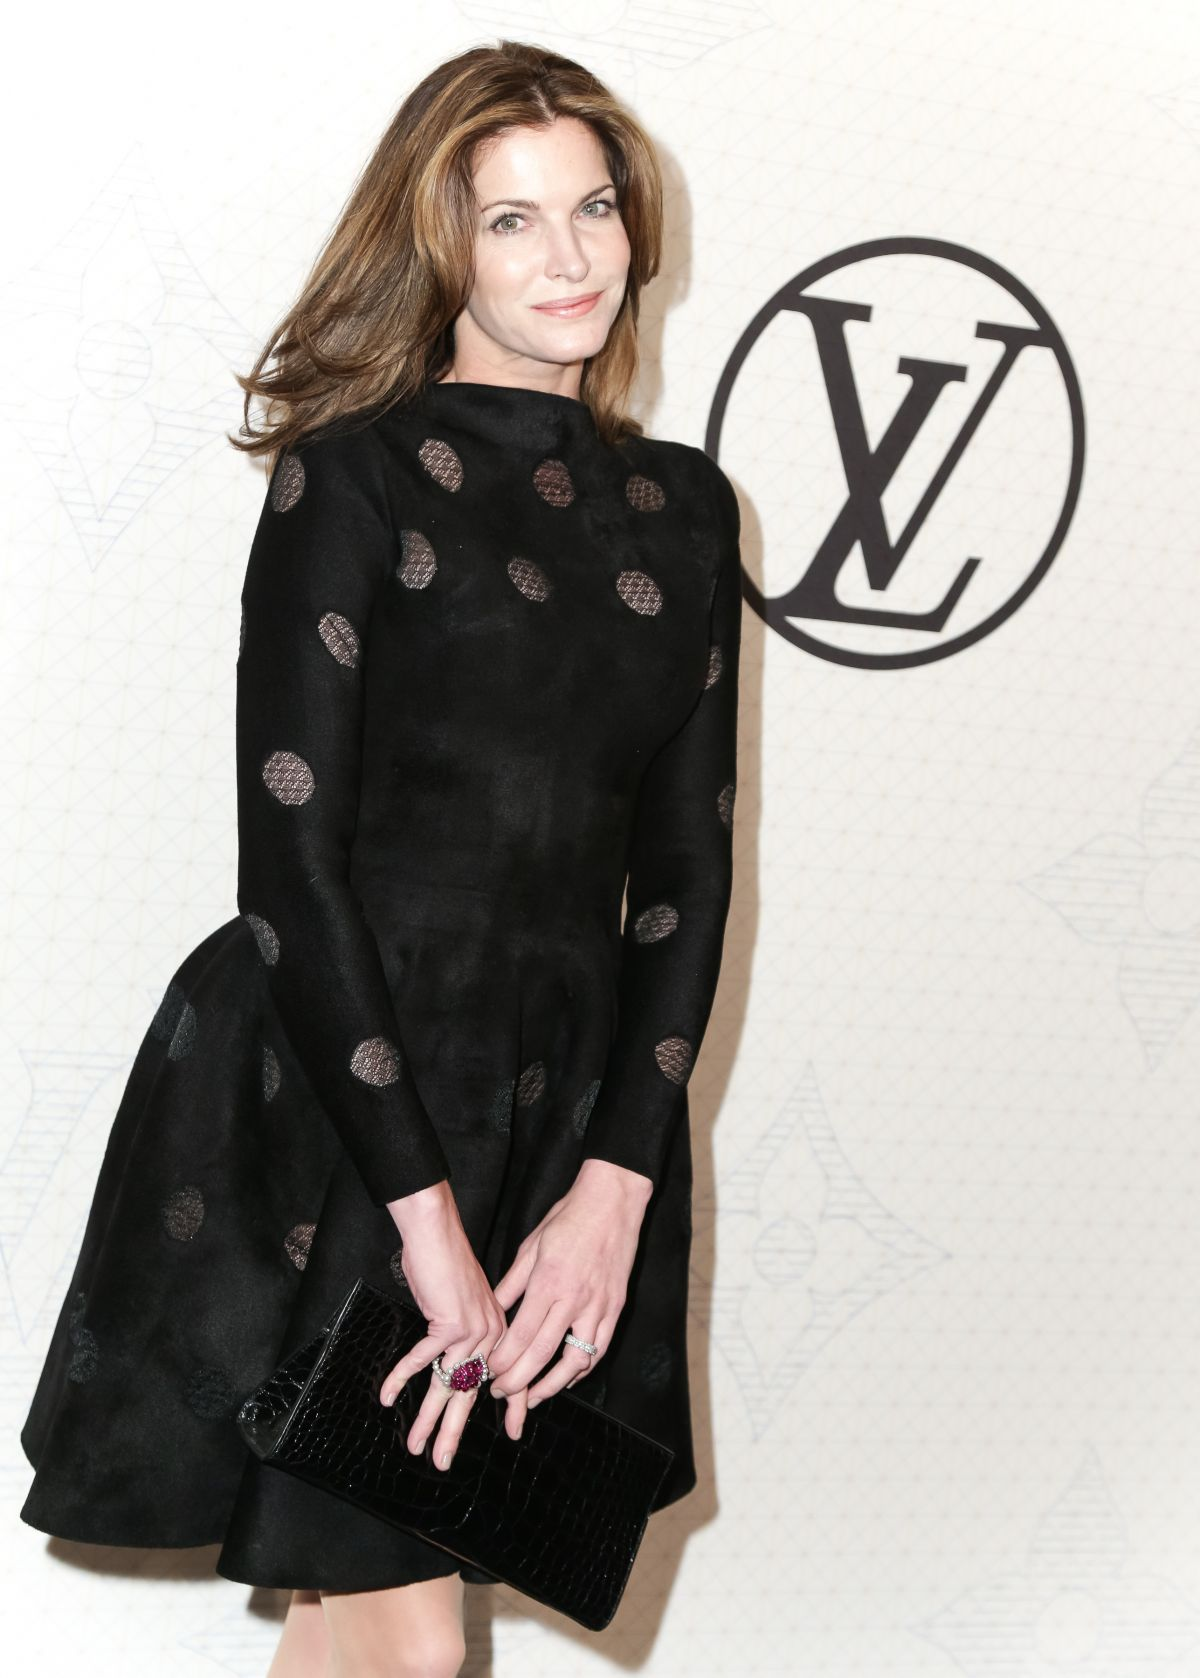 STEPHANIE SEYMOUR at Louis Vuitton Monogram Celebration in New York